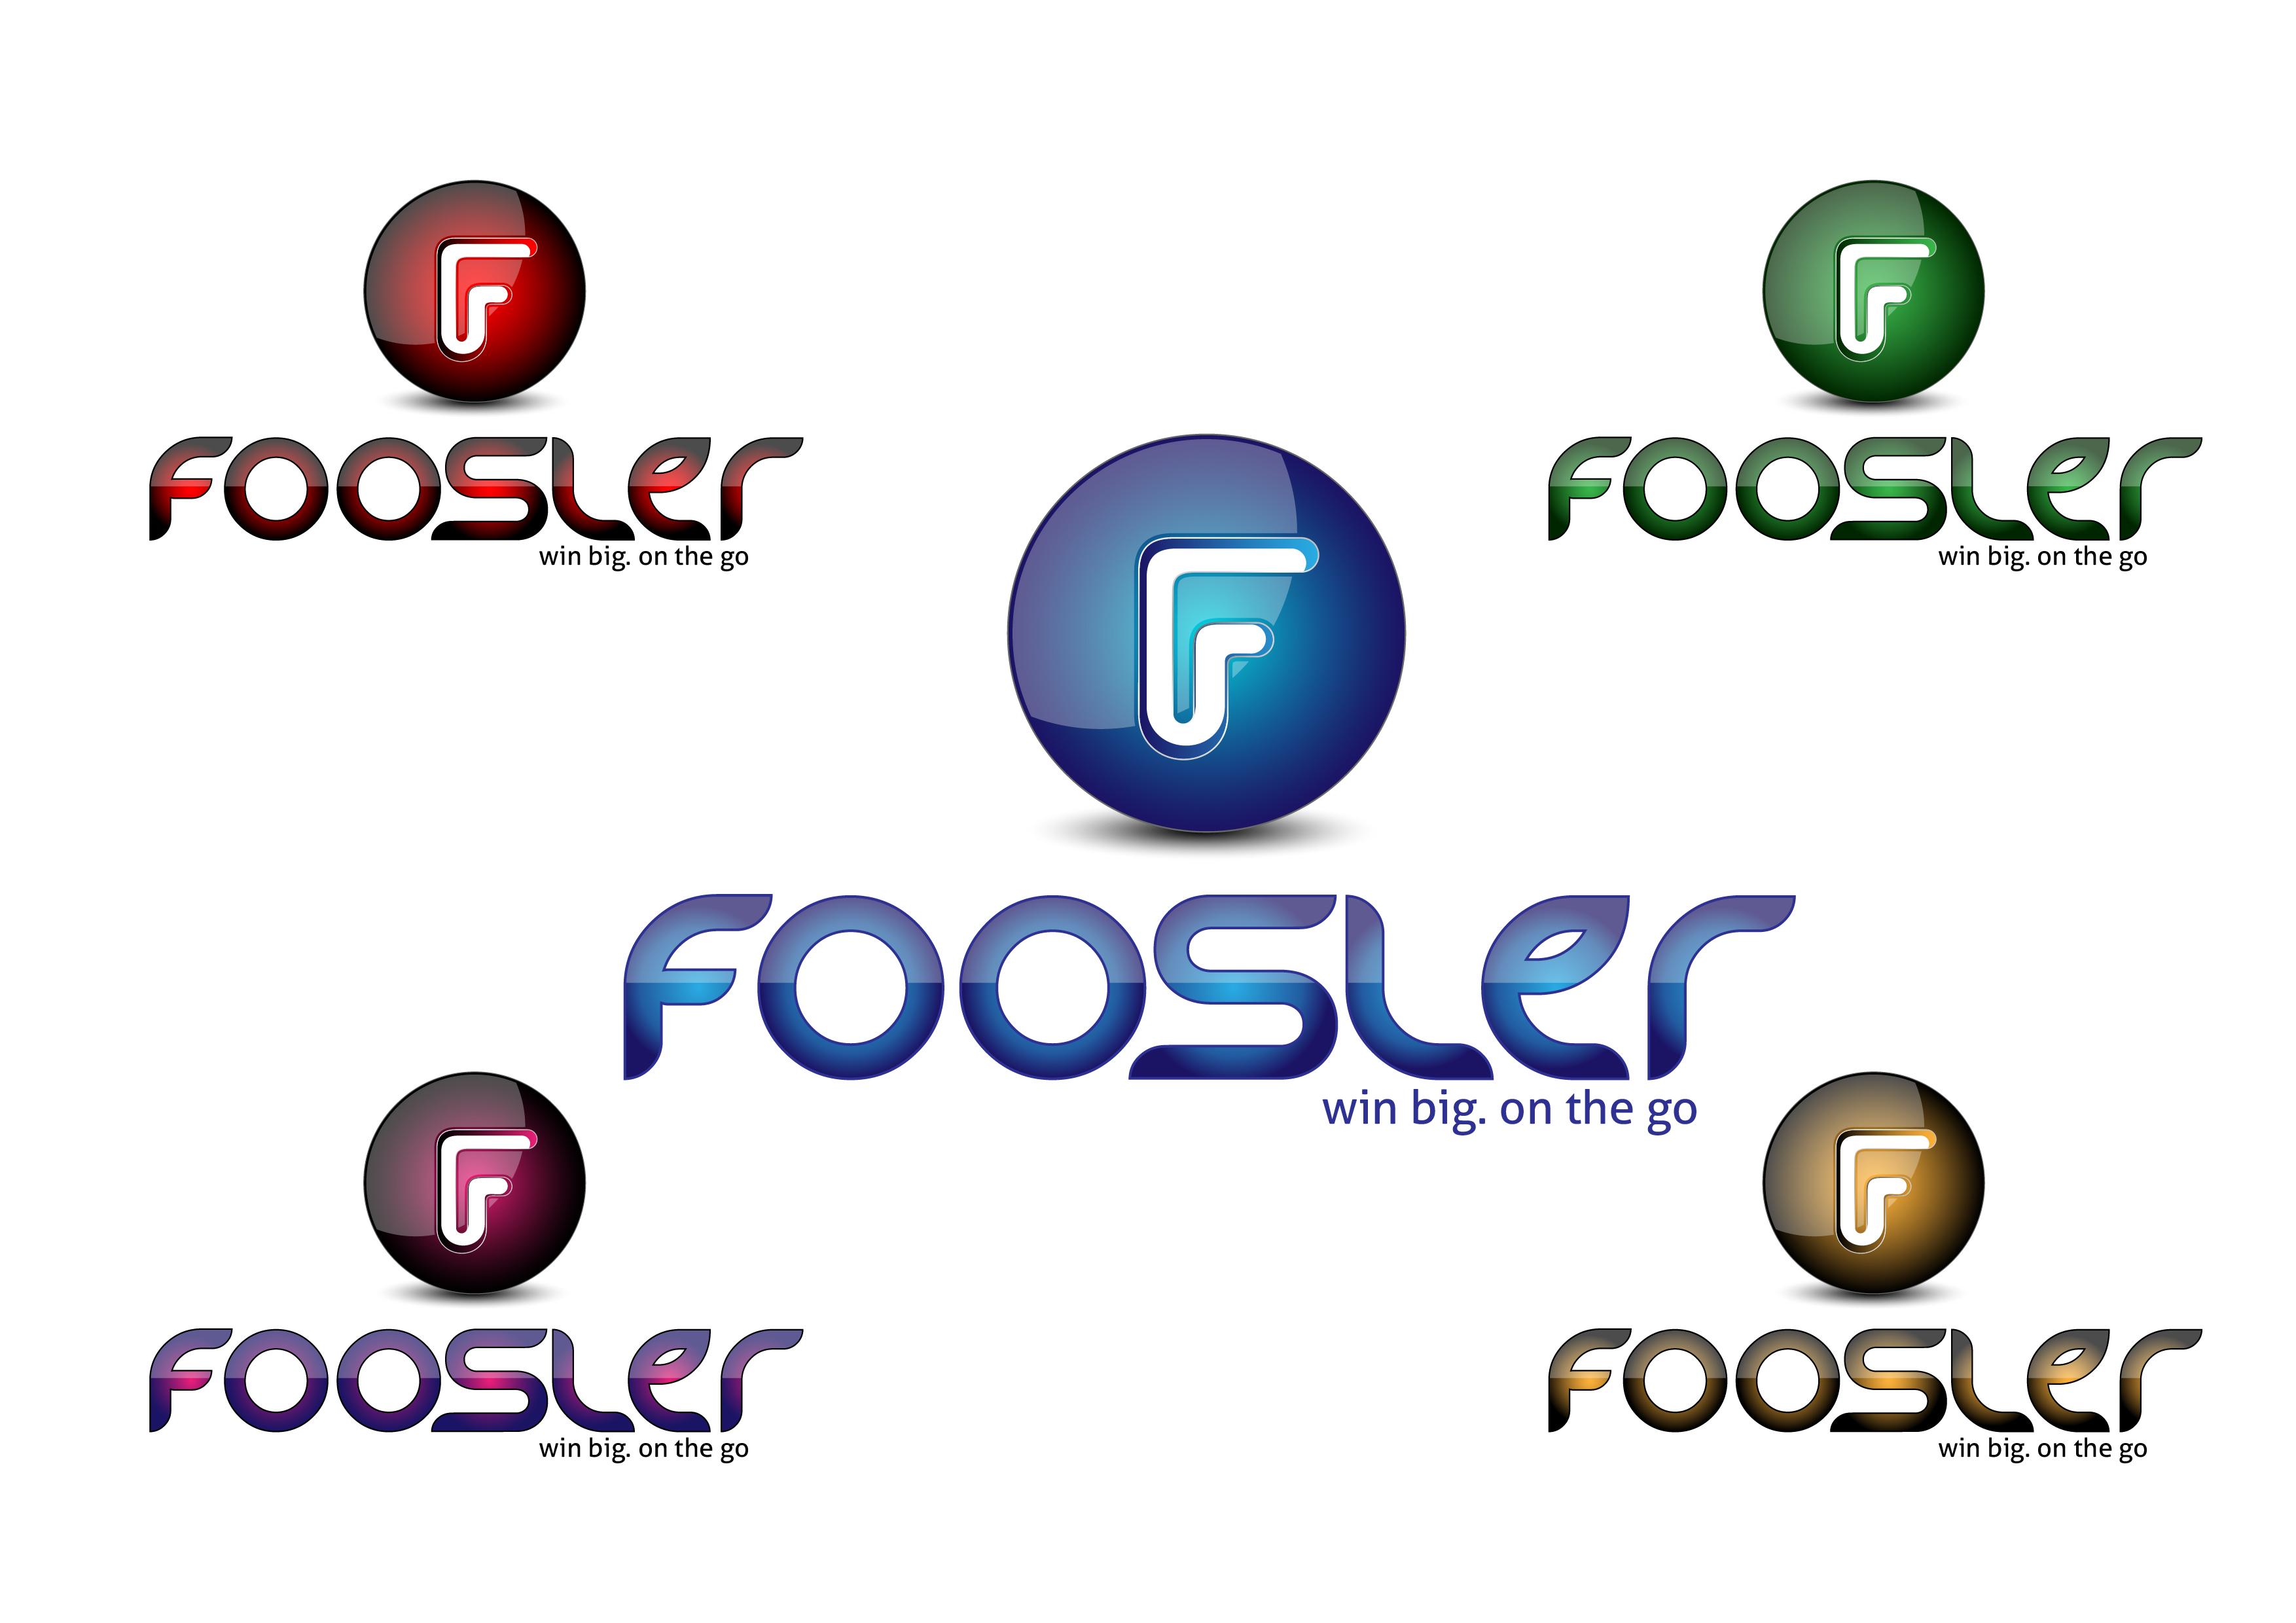 Logo Design by 3draw - Entry No. 119 in the Logo Design Contest Foosler Logo Design.